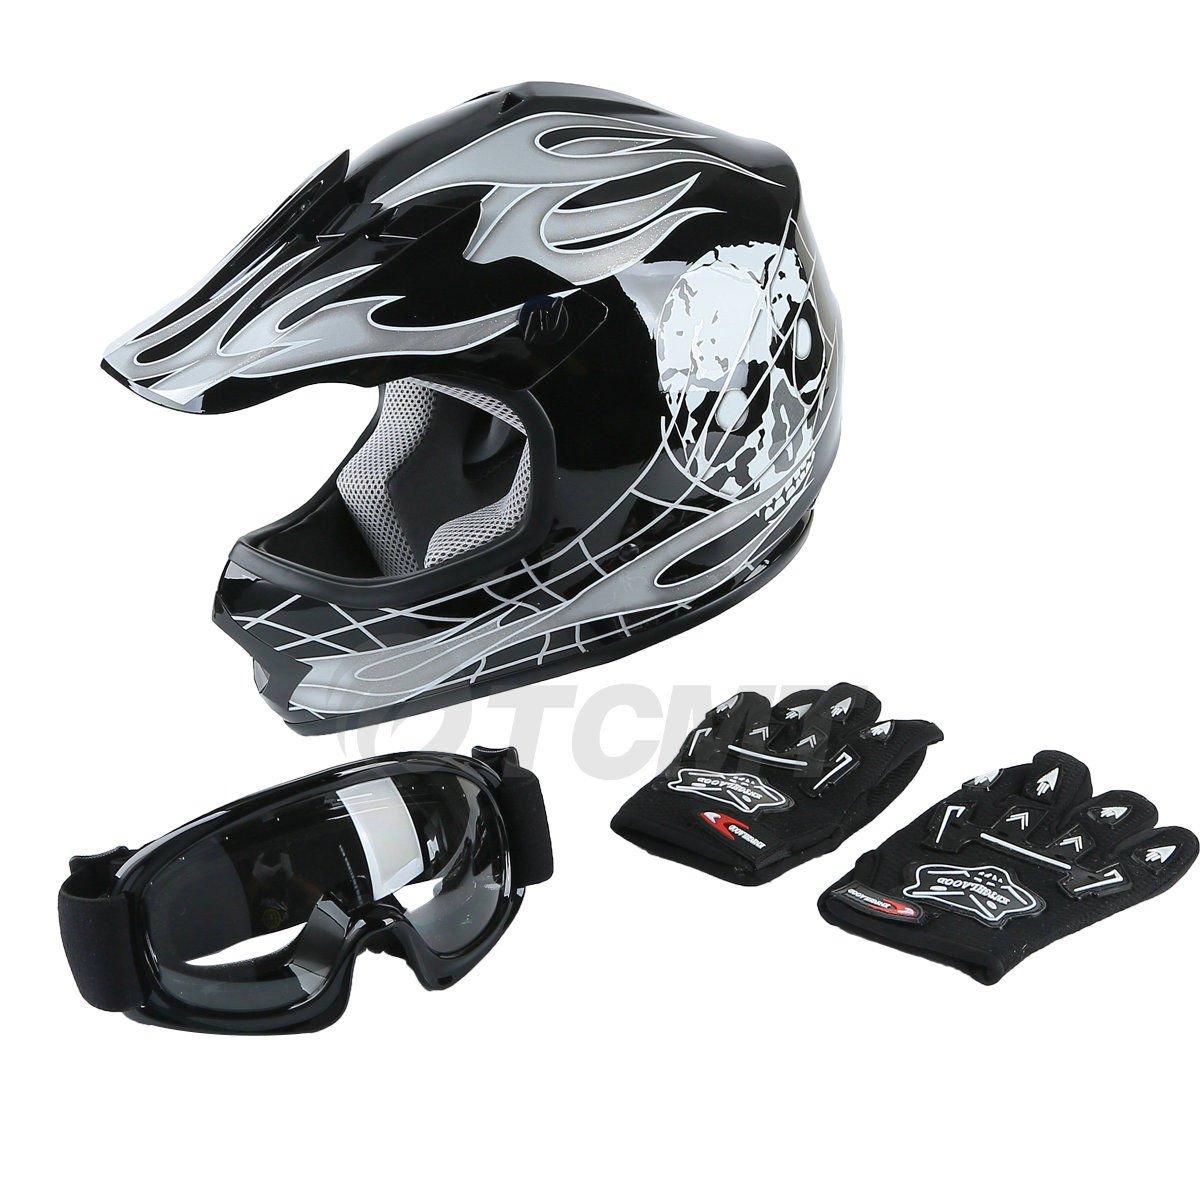 TCMT Dot Youth & Kids Motocross Offroad Street Helmet Black Skull Motorcycle Helmet Silver Dirt Bike Helmet+Goggles+gloves L